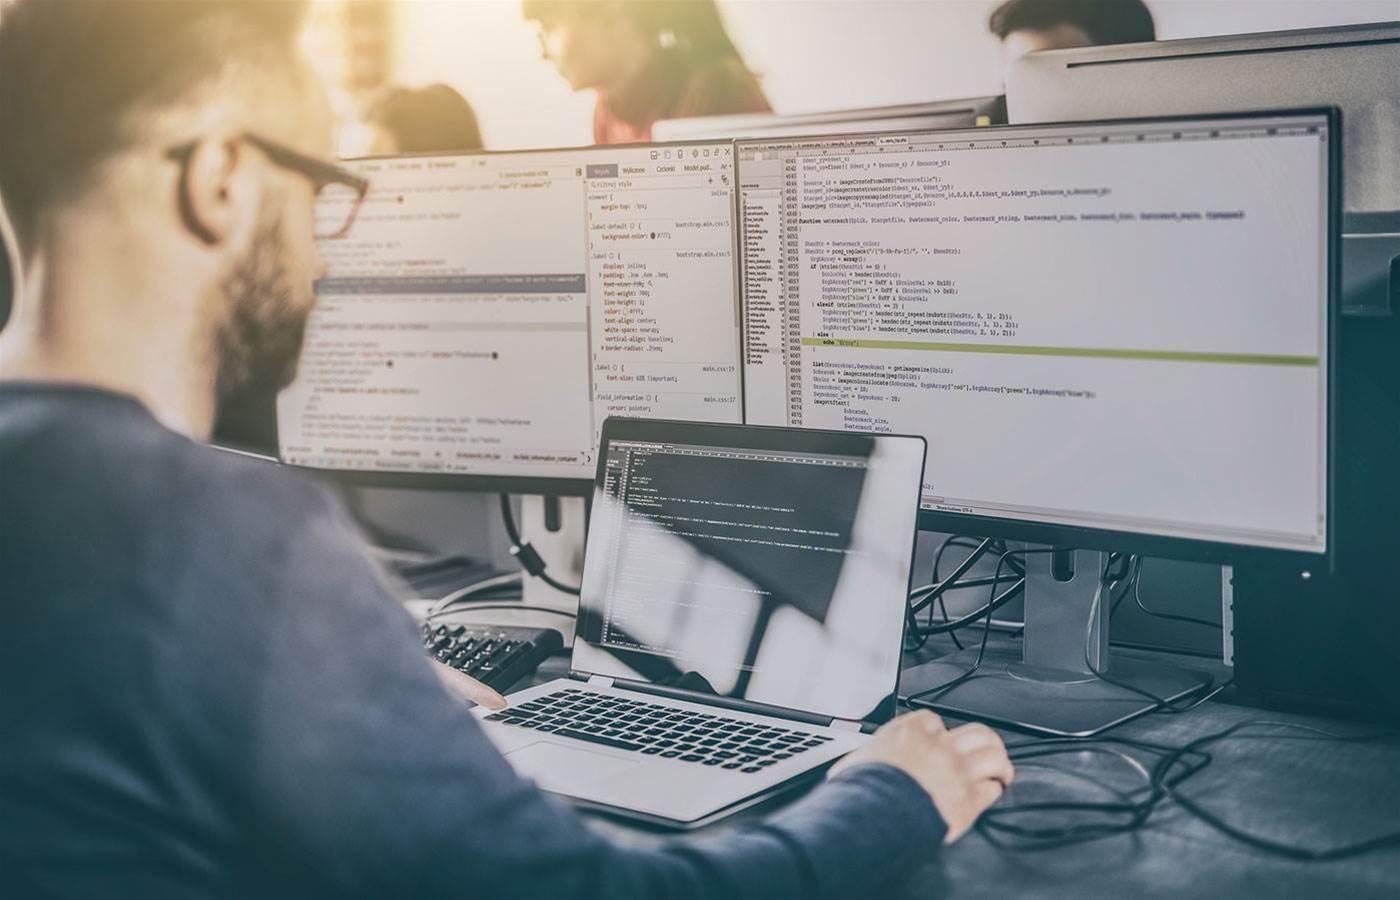 Australia needs to improve IT education, training: report